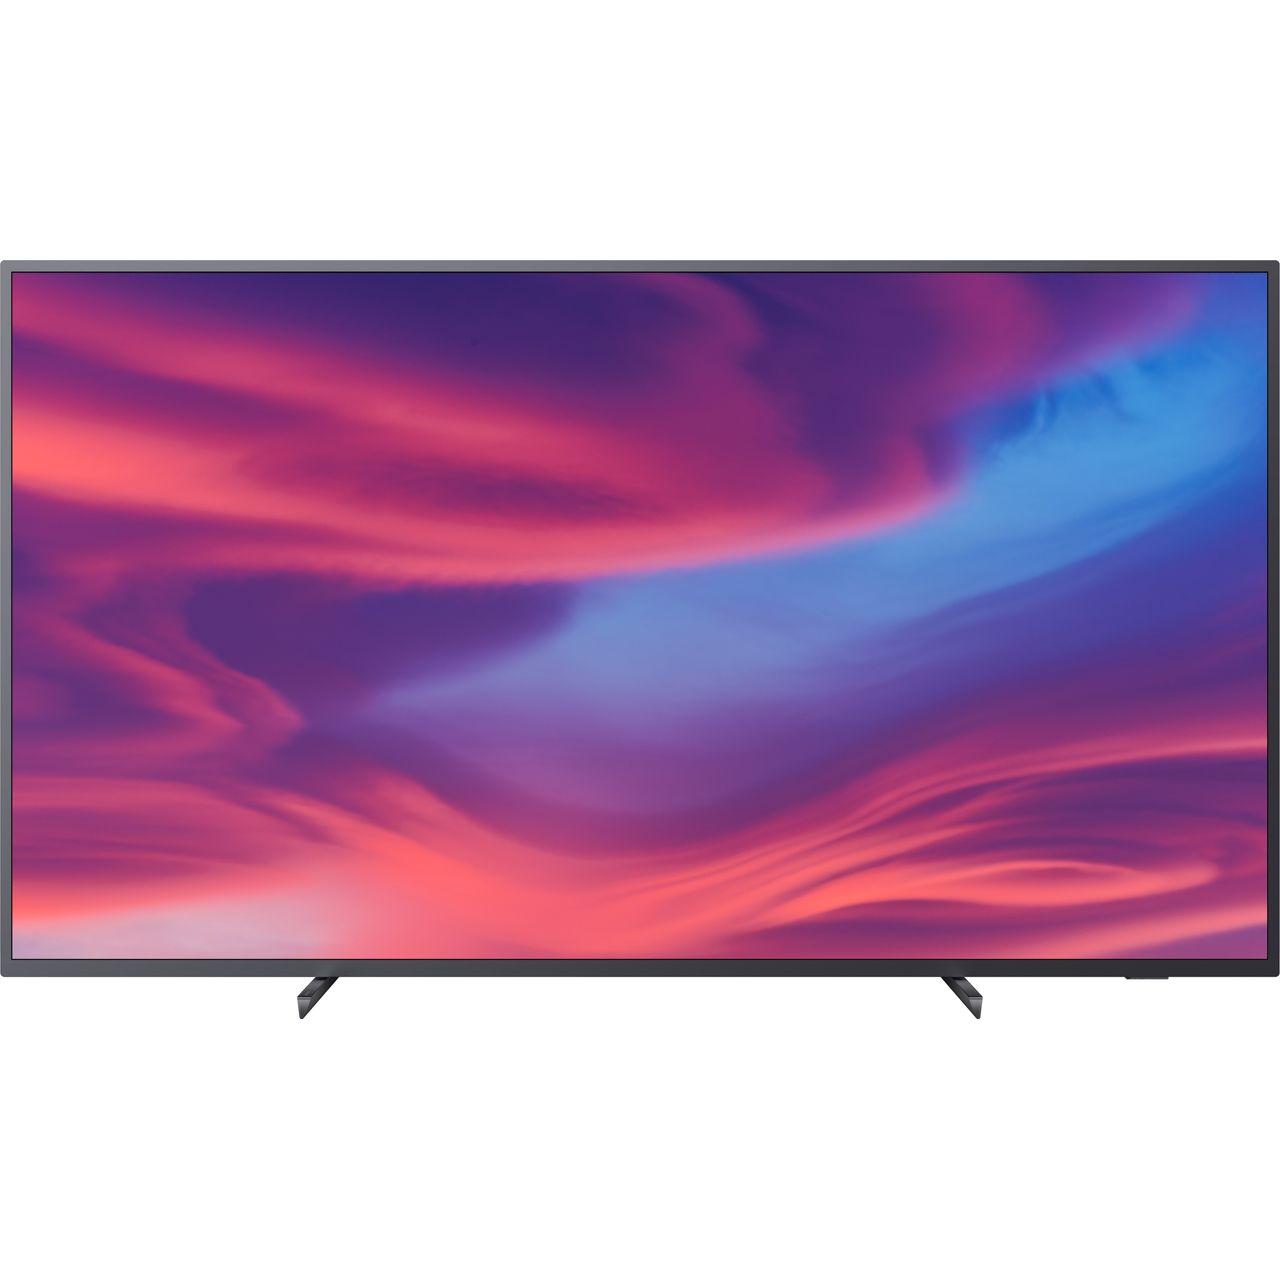 "Philips 70PUS6724 70"" Smart Ambilight 4K Ultra HD TV + Philips HTL1508 Soundbar - £697 Delivered @ AO"